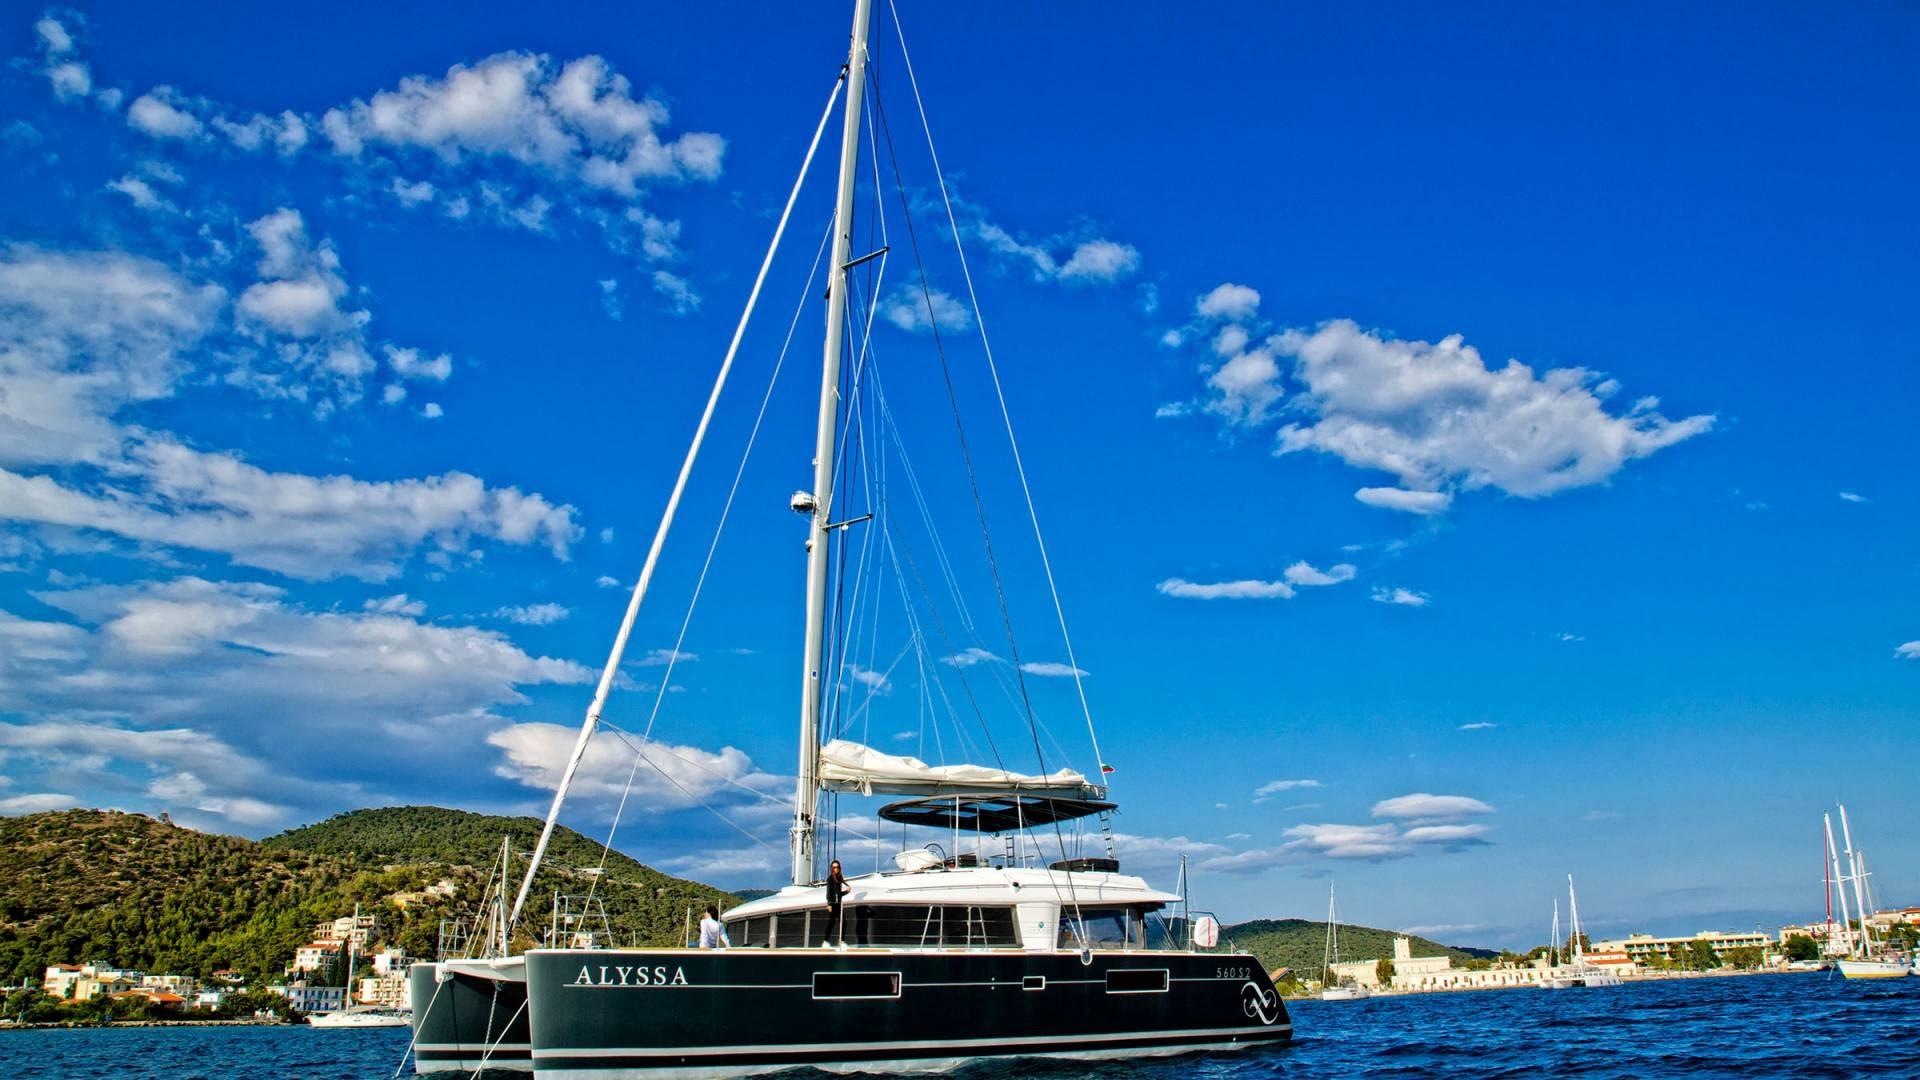 sailing-greece-cyclades-crewed-charters-3-l.jpg